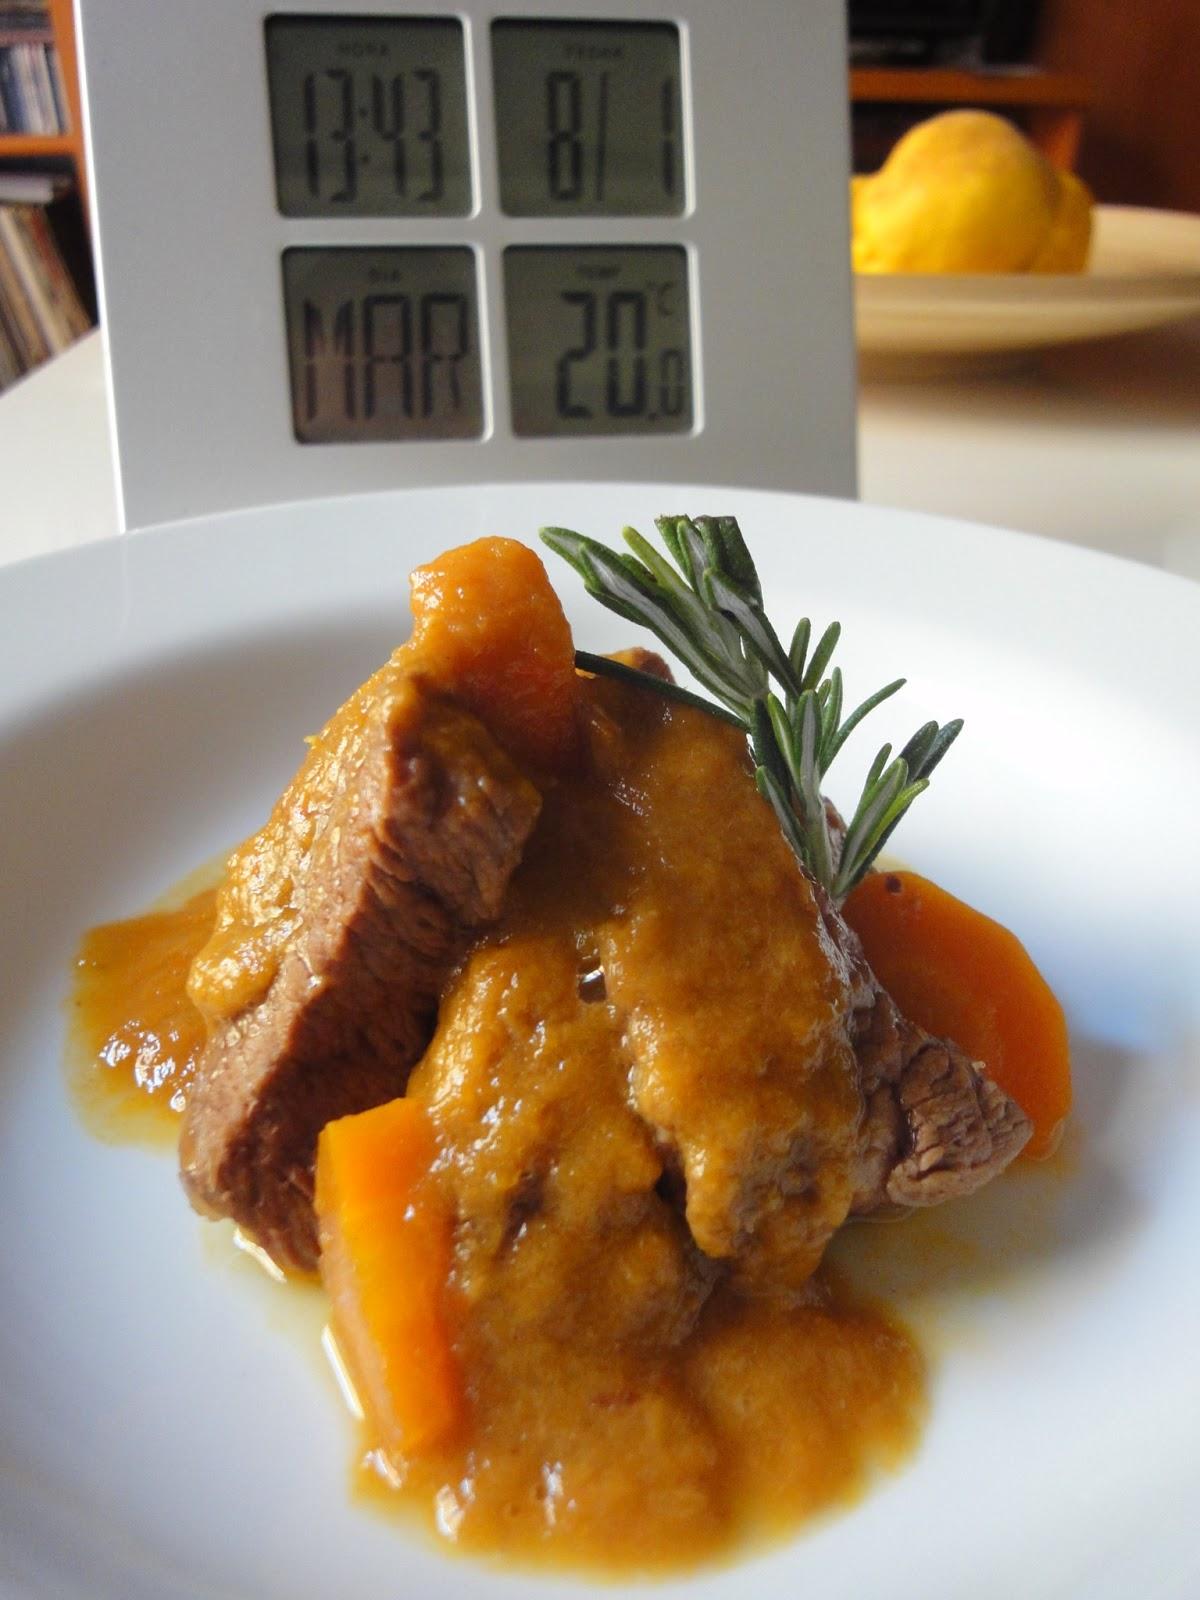 Clases de cocina zaragoza rag de ternera en olla r pida - Cursos de cocina zaragoza ...